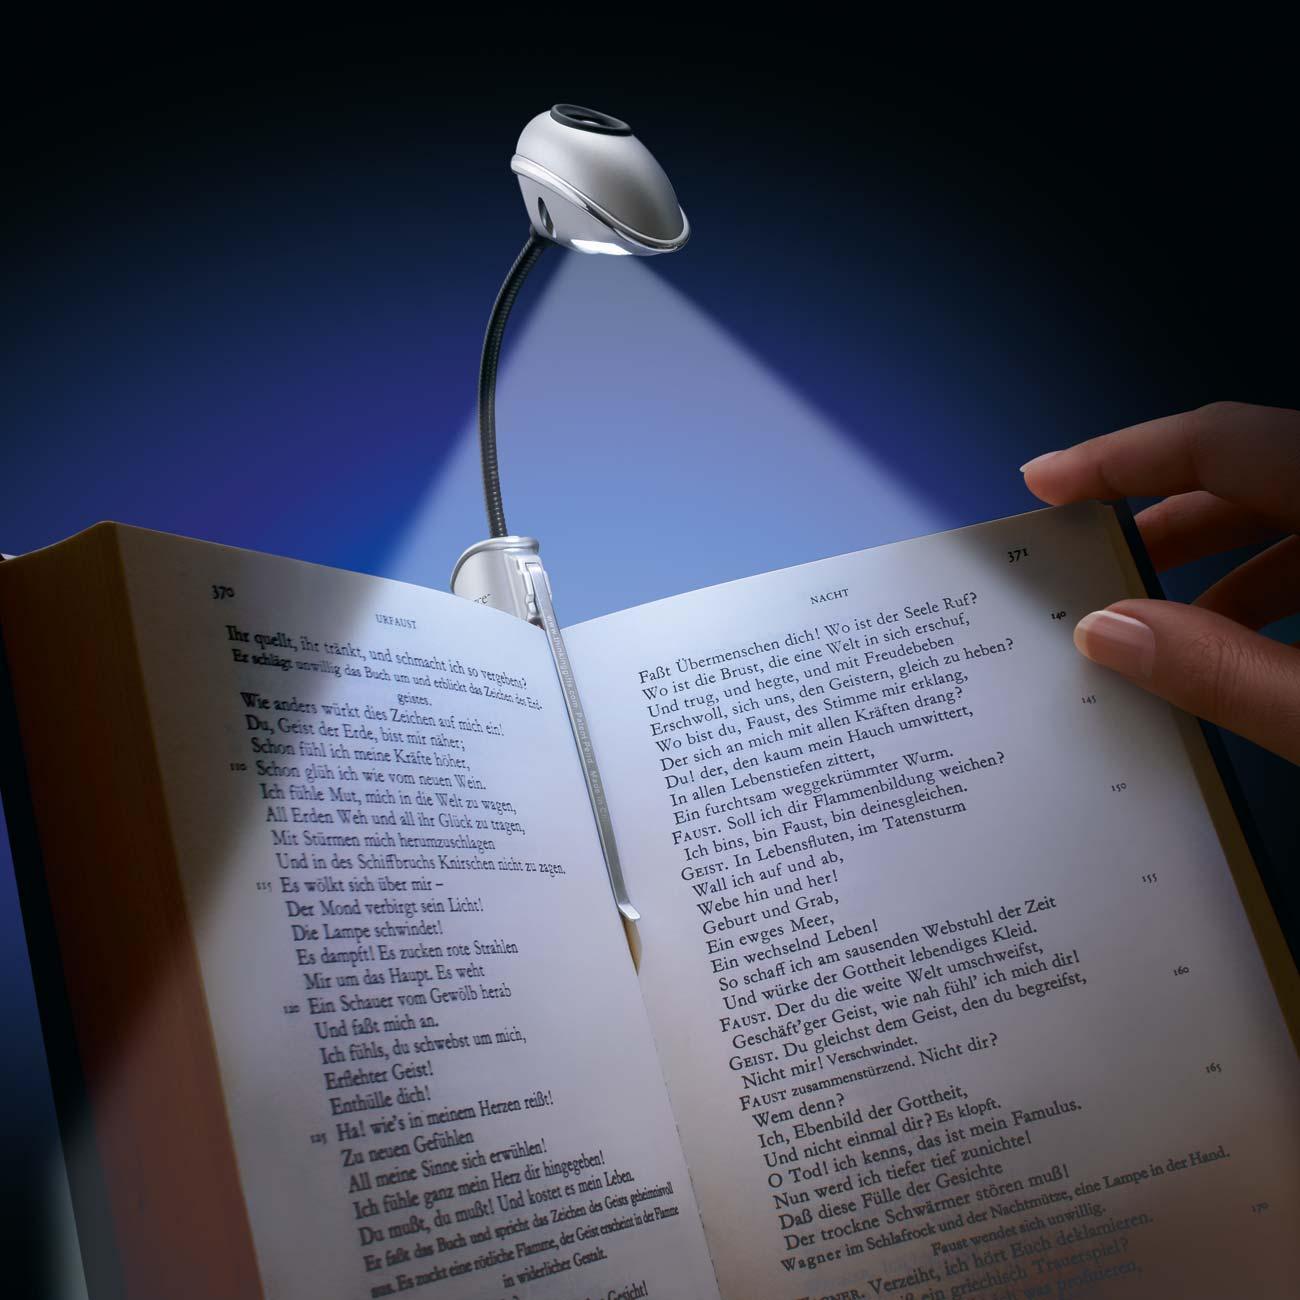 mobilier table lampe lecture livre. Black Bedroom Furniture Sets. Home Design Ideas